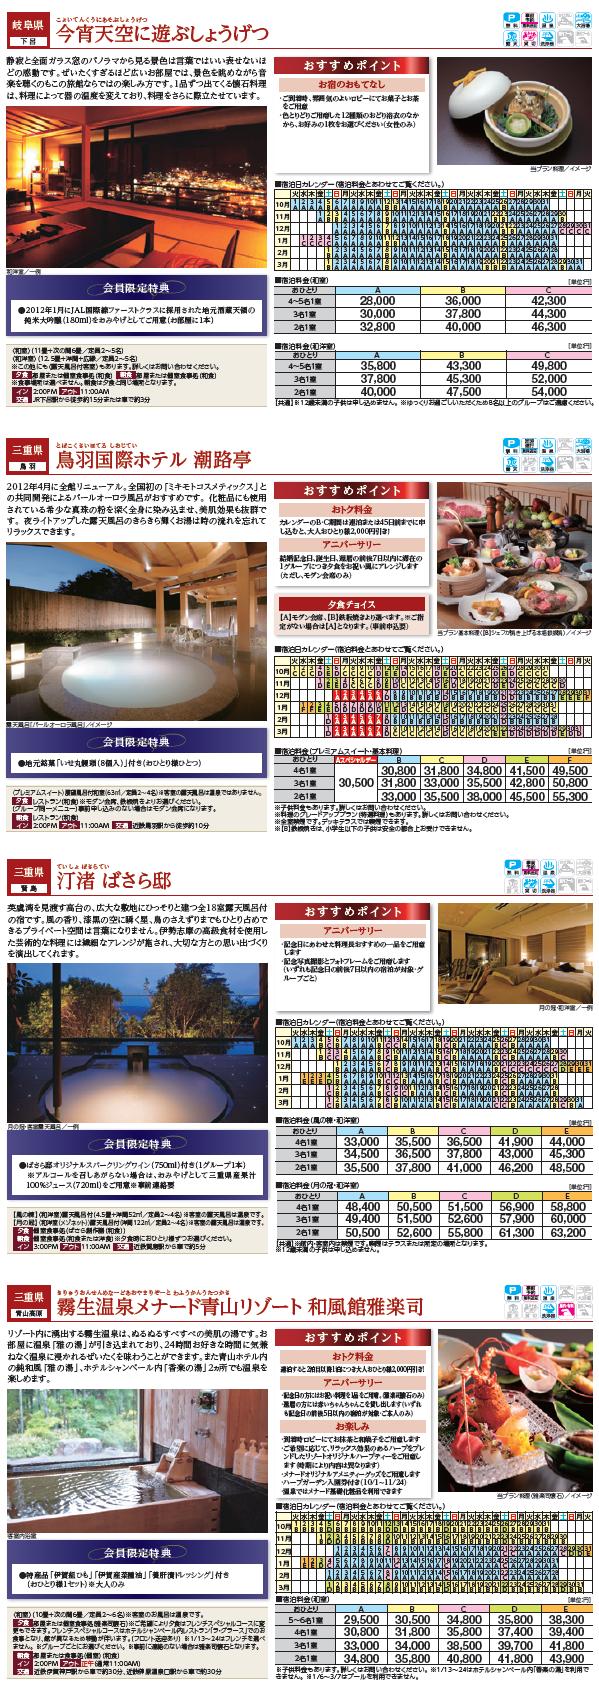 ryokan_plan1310_16